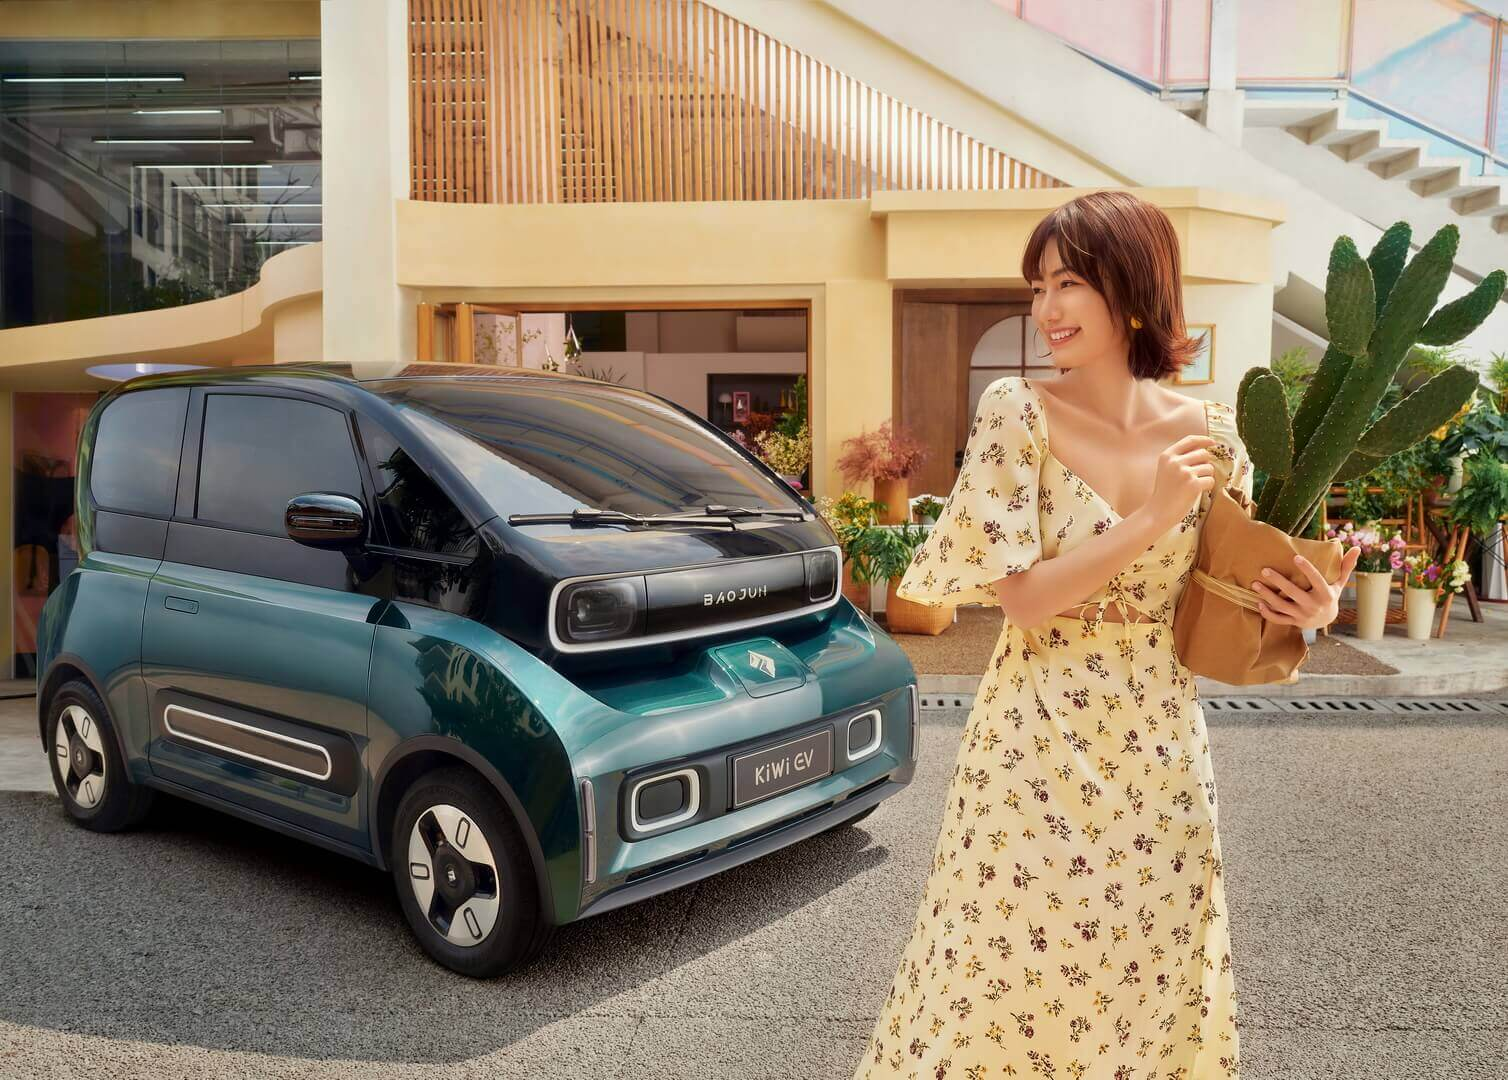 В Китае представлен мини-электромобиль Baojun KiWi с запасом хода 305 км